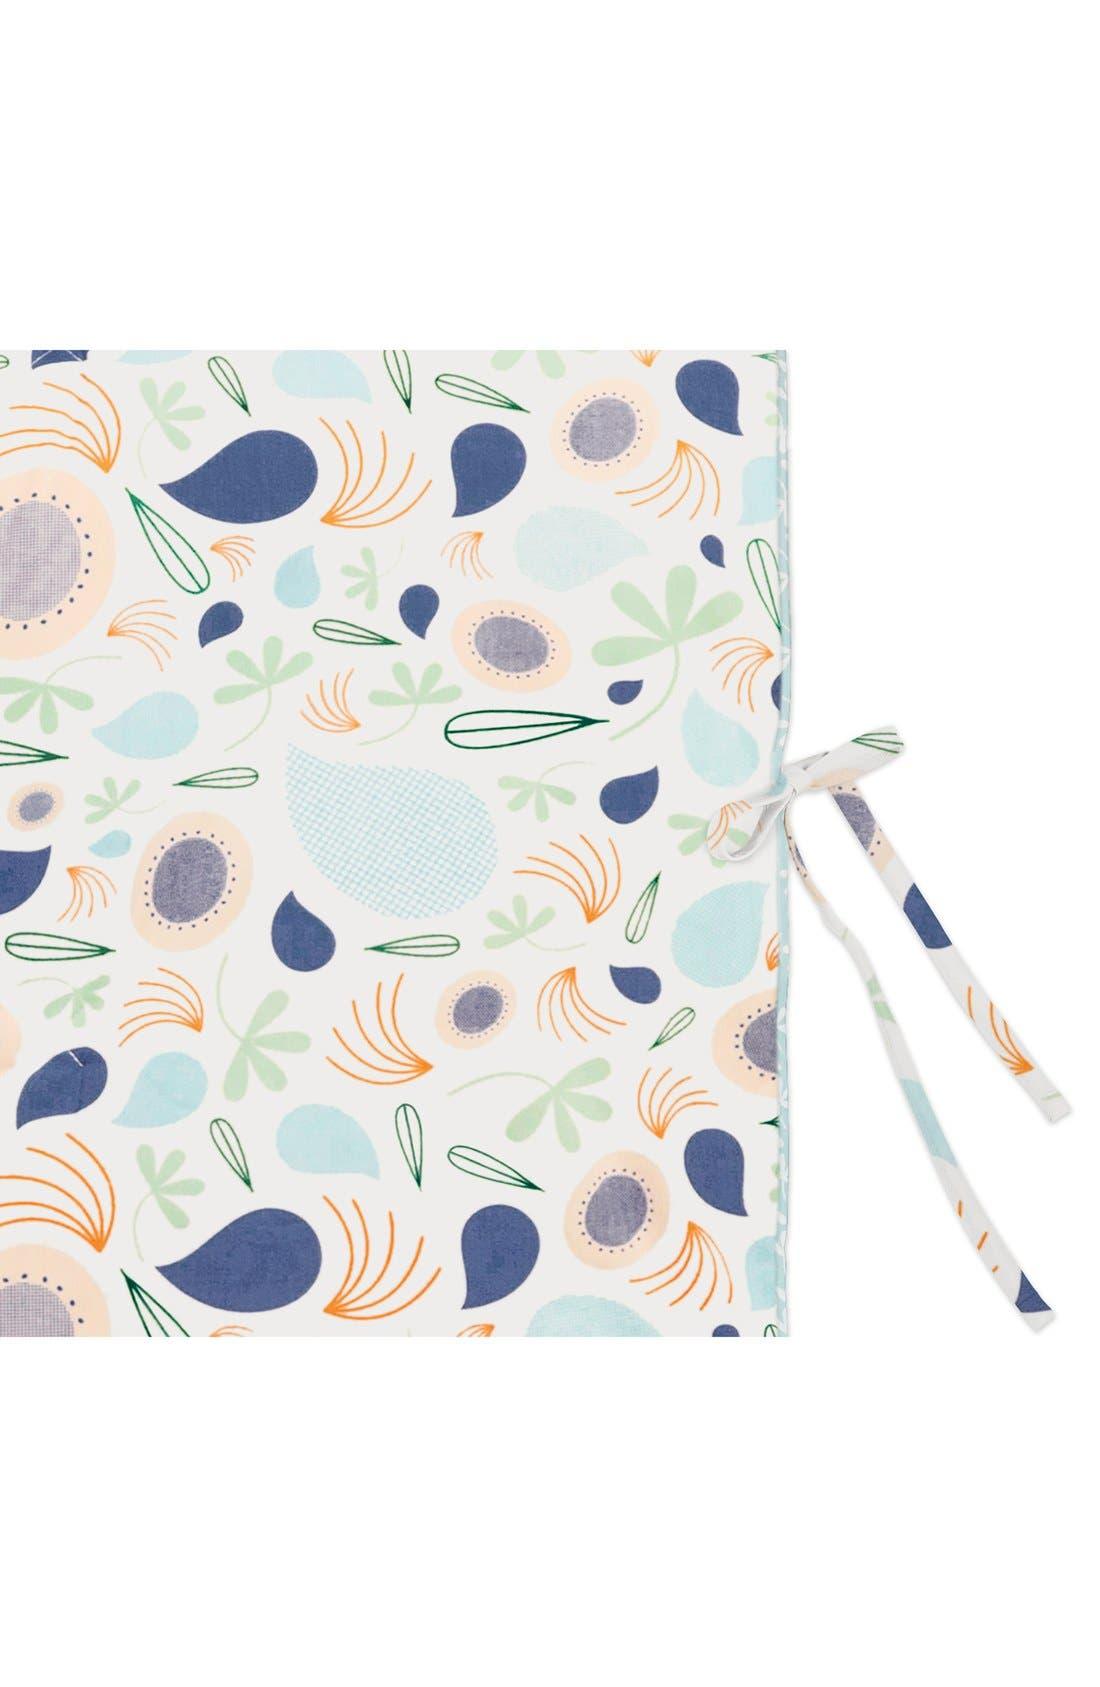 'Flora' Crib Sheet, Crib Skirt, Stroller Blanket & Wall Decals,                             Alternate thumbnail 5, color,                             400